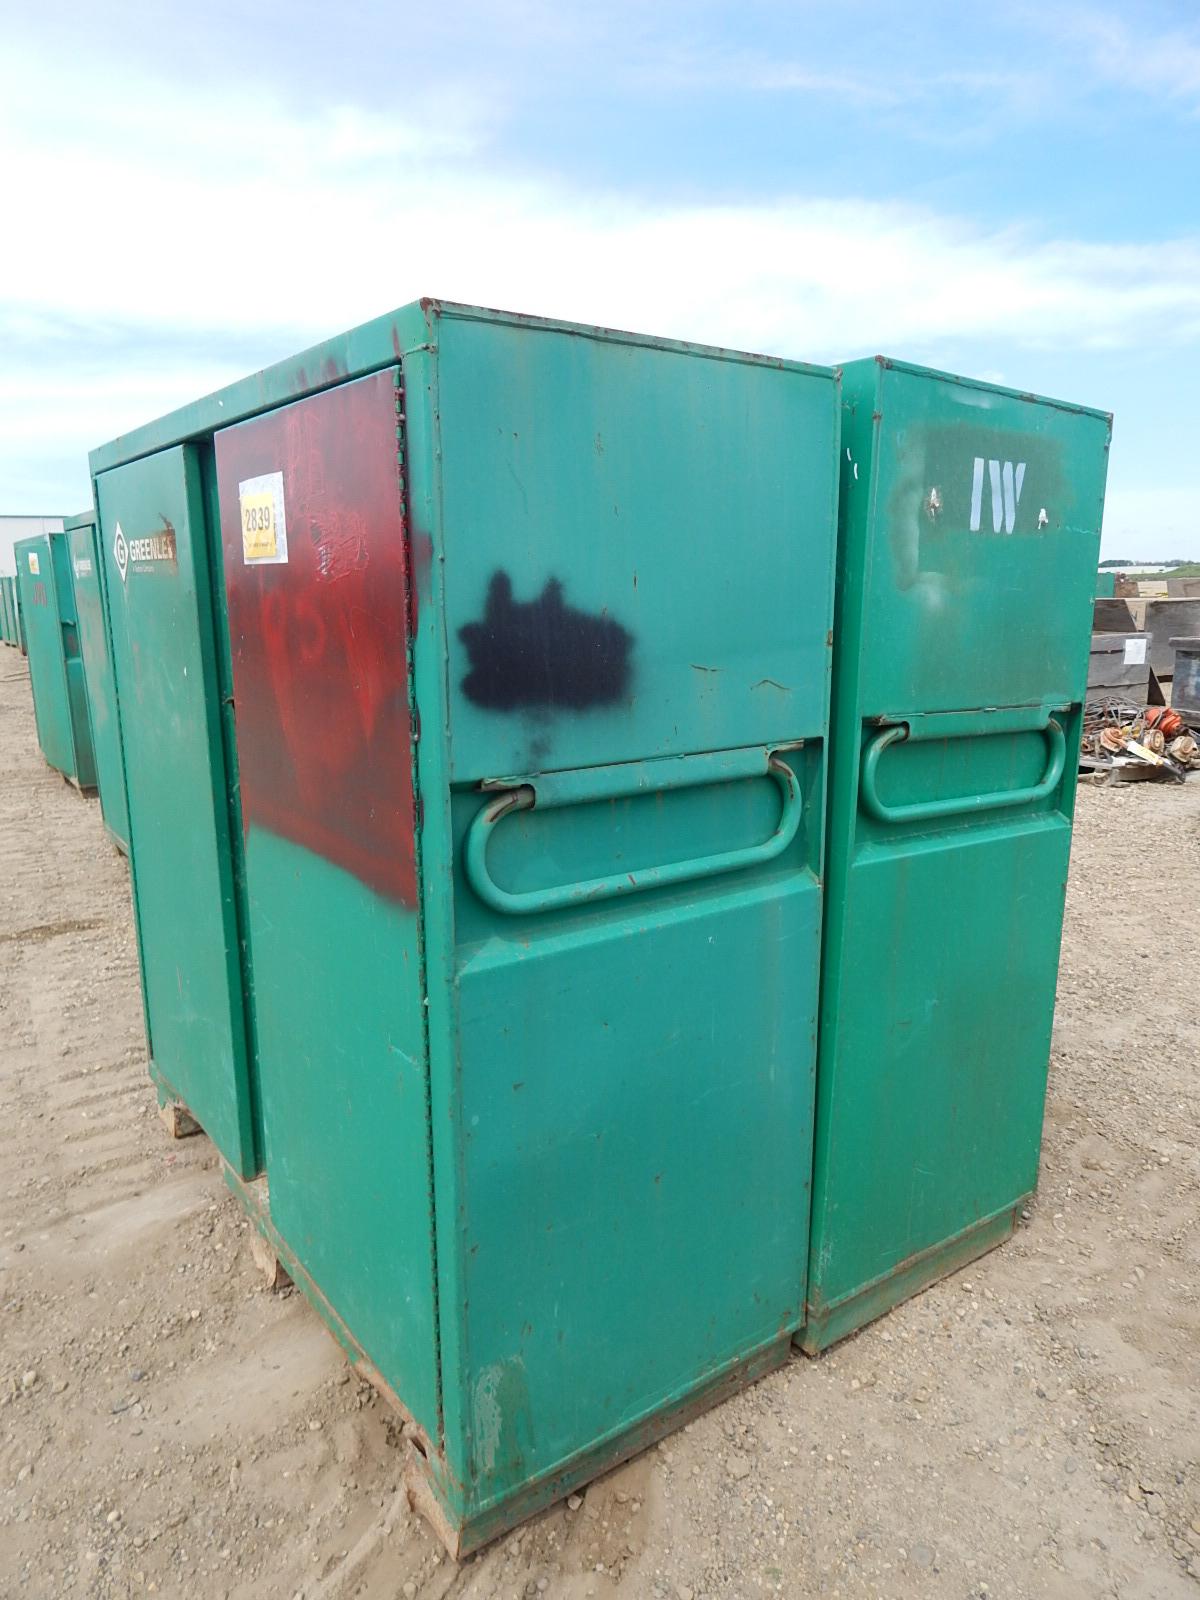 LOT/ (2) GREENLEE 2-DOOR JOB BOX CABINETS - Image 2 of 4